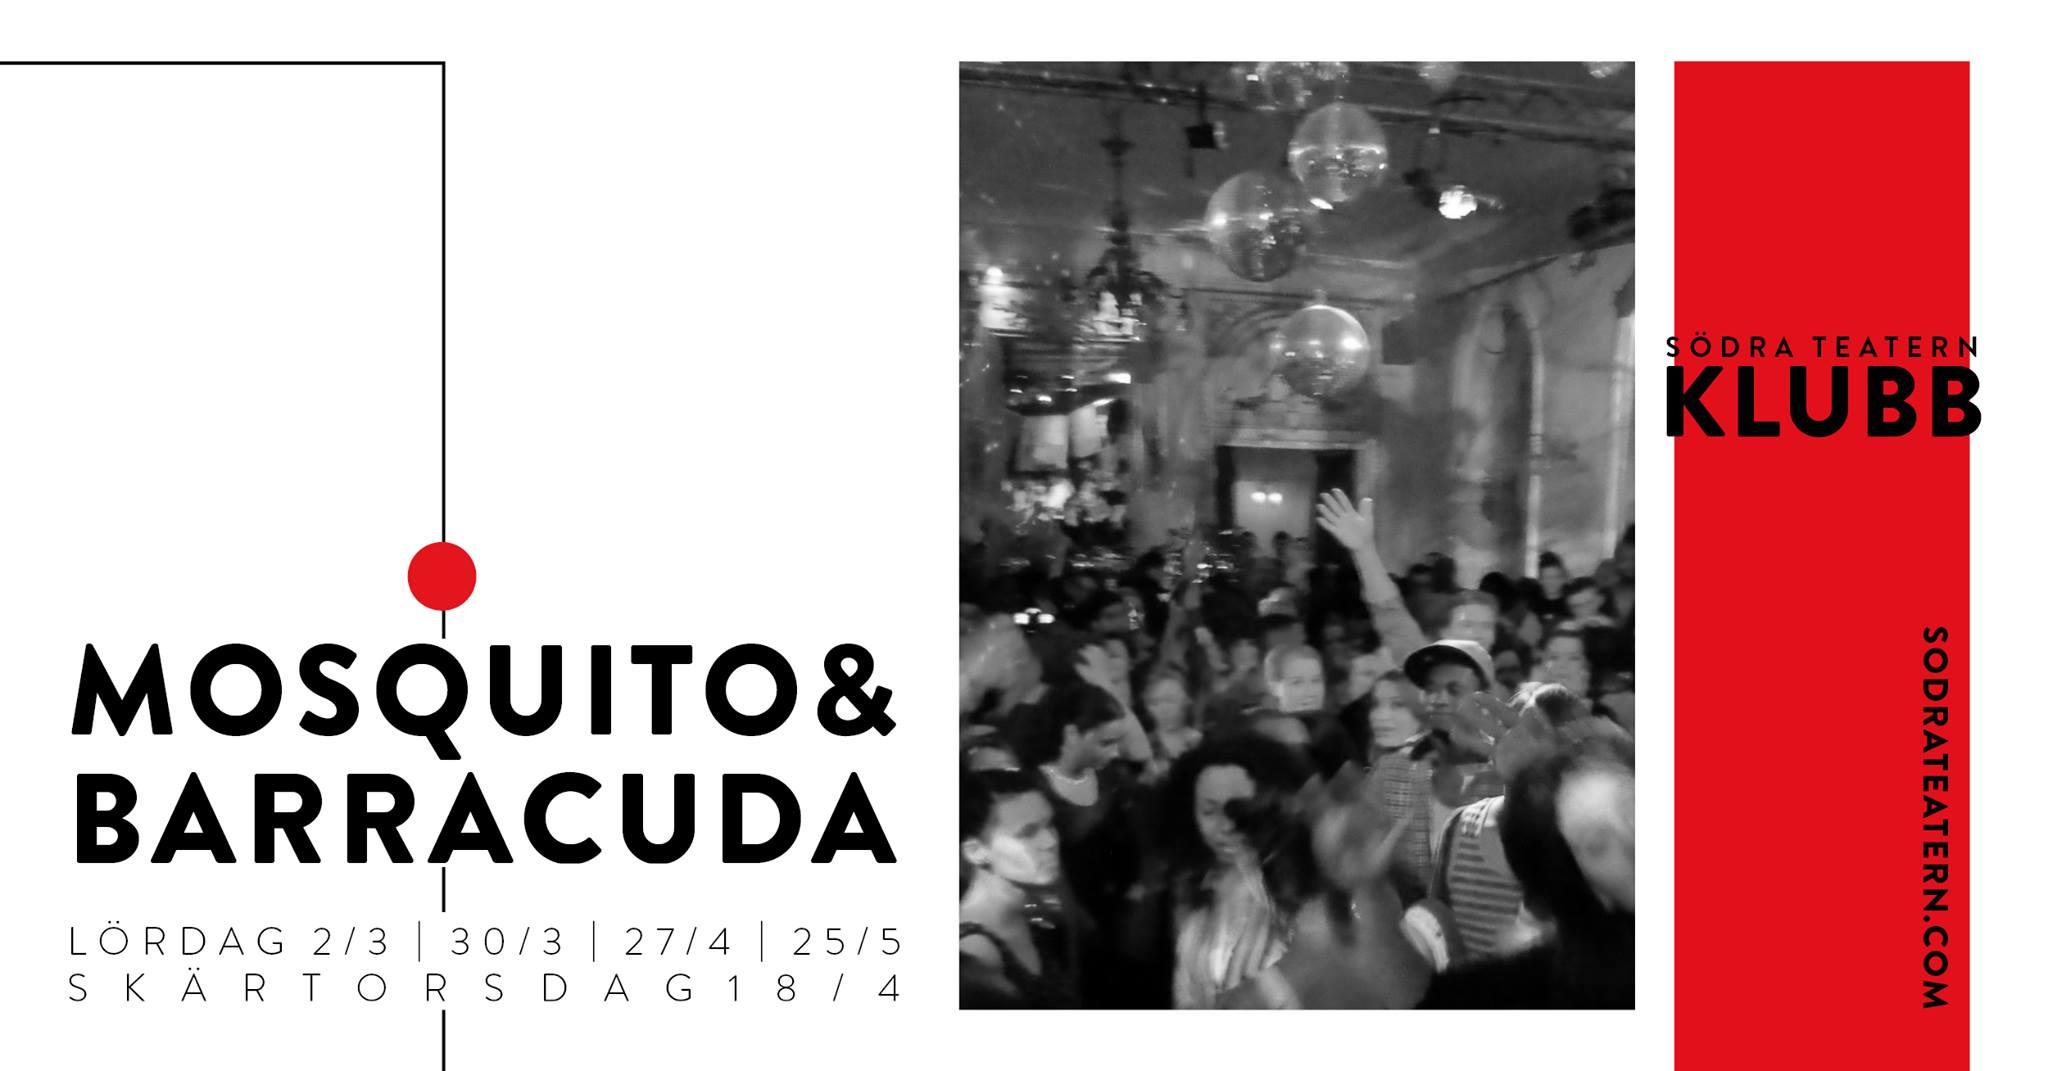 Klubb: Mosquito & Barracuda!